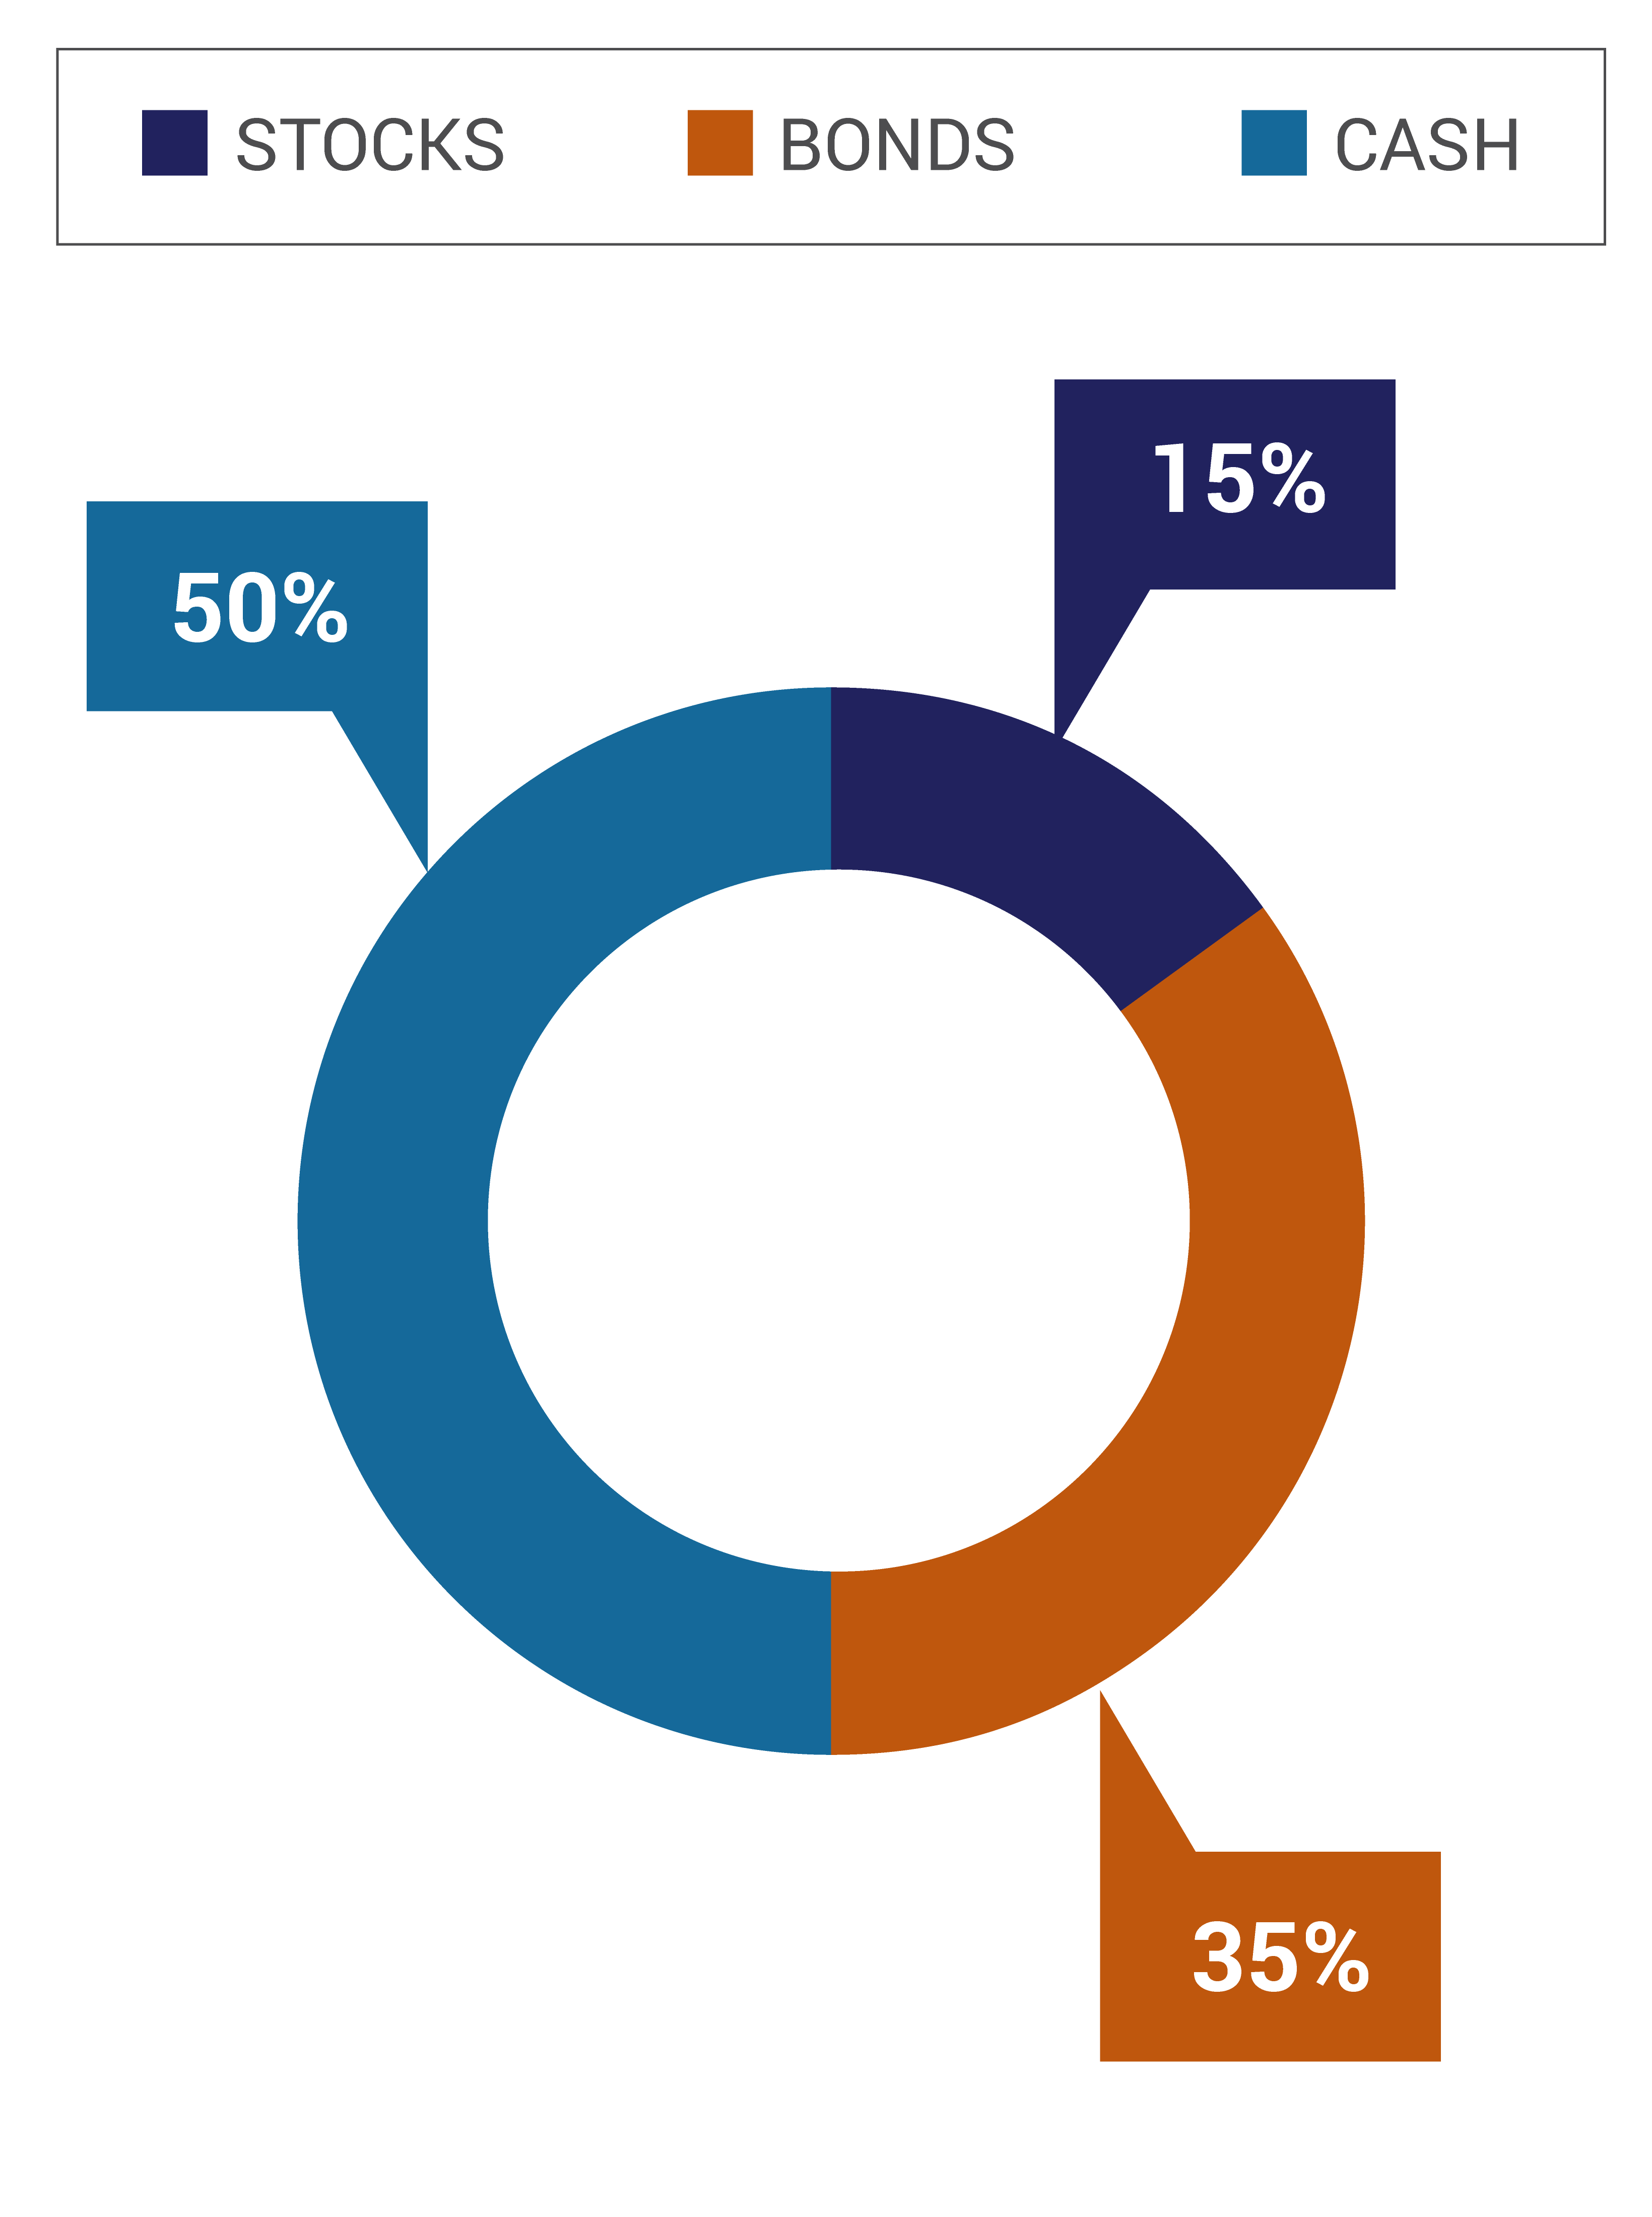 The Conservative Portfolio Option consists of 15% Stocks, 35% Bonds, and 50% Cash.